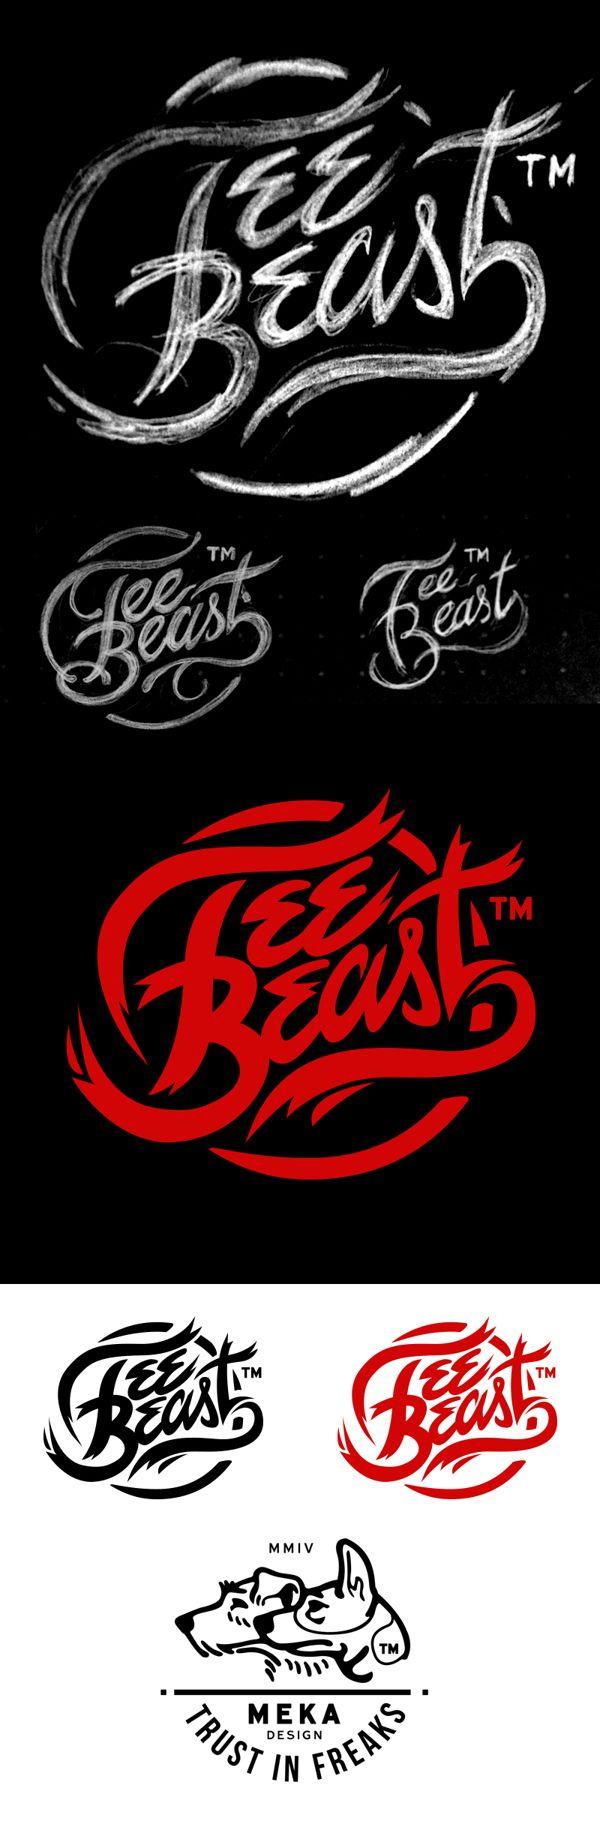 Tee Beast Logo Design by MEKA, via Behance